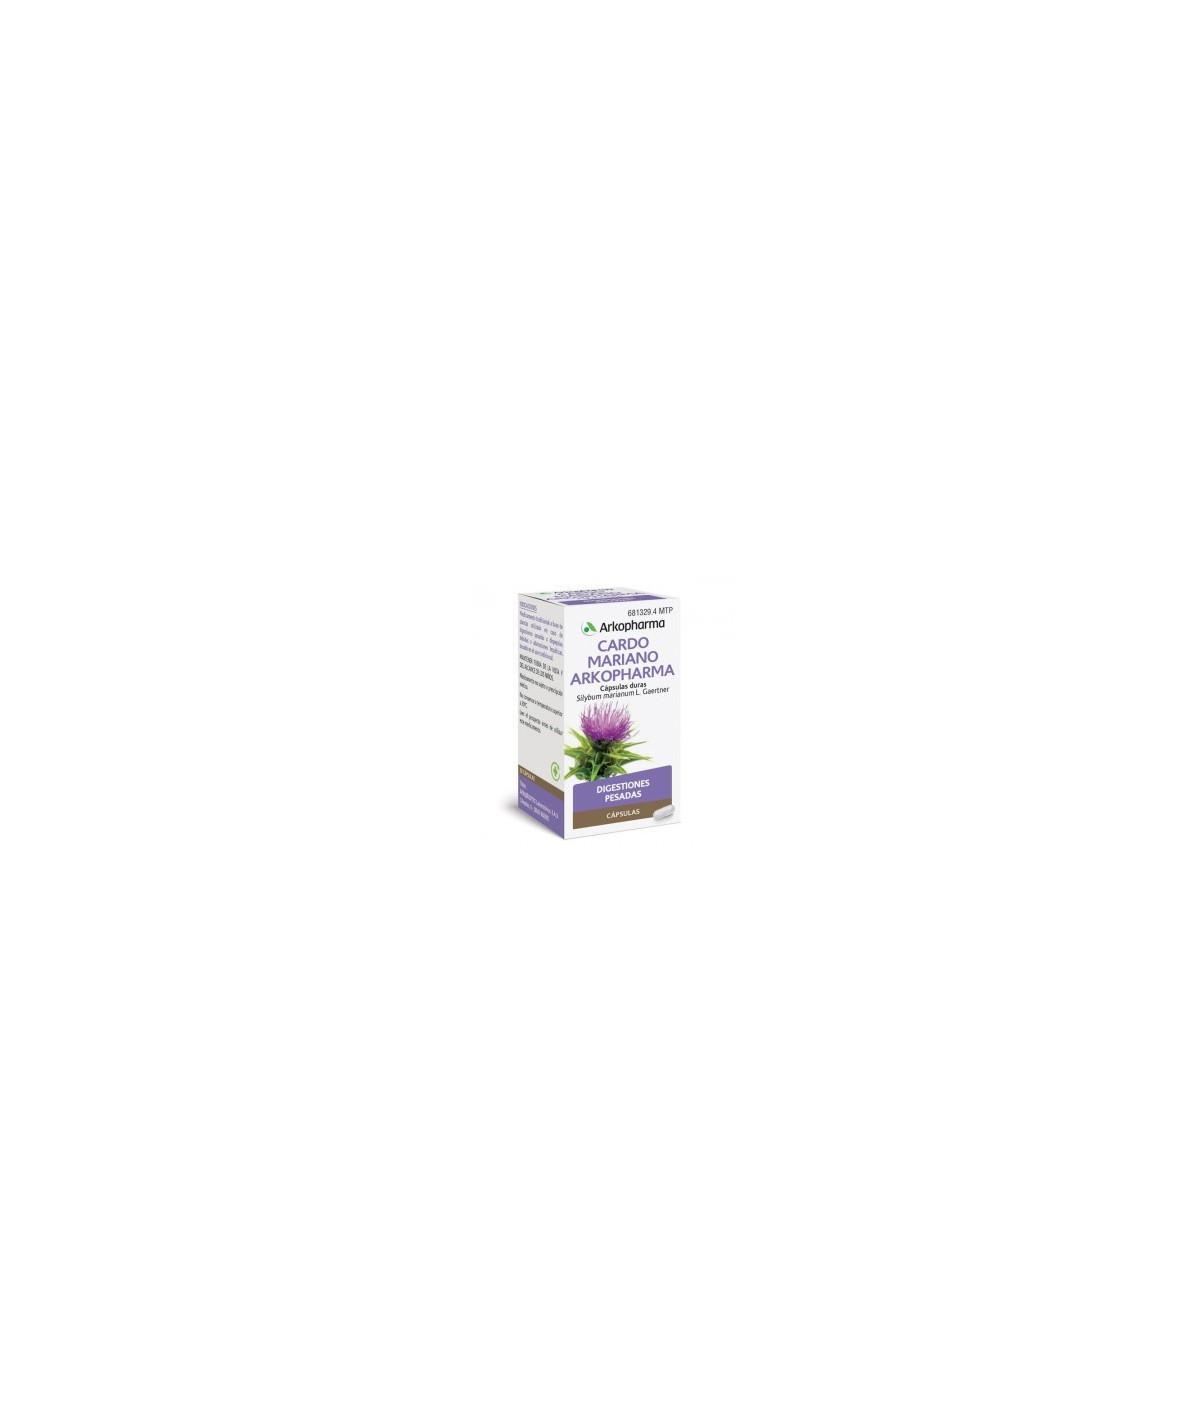 Solución micelar natural hidratante 250 ML - Gema Herrerias